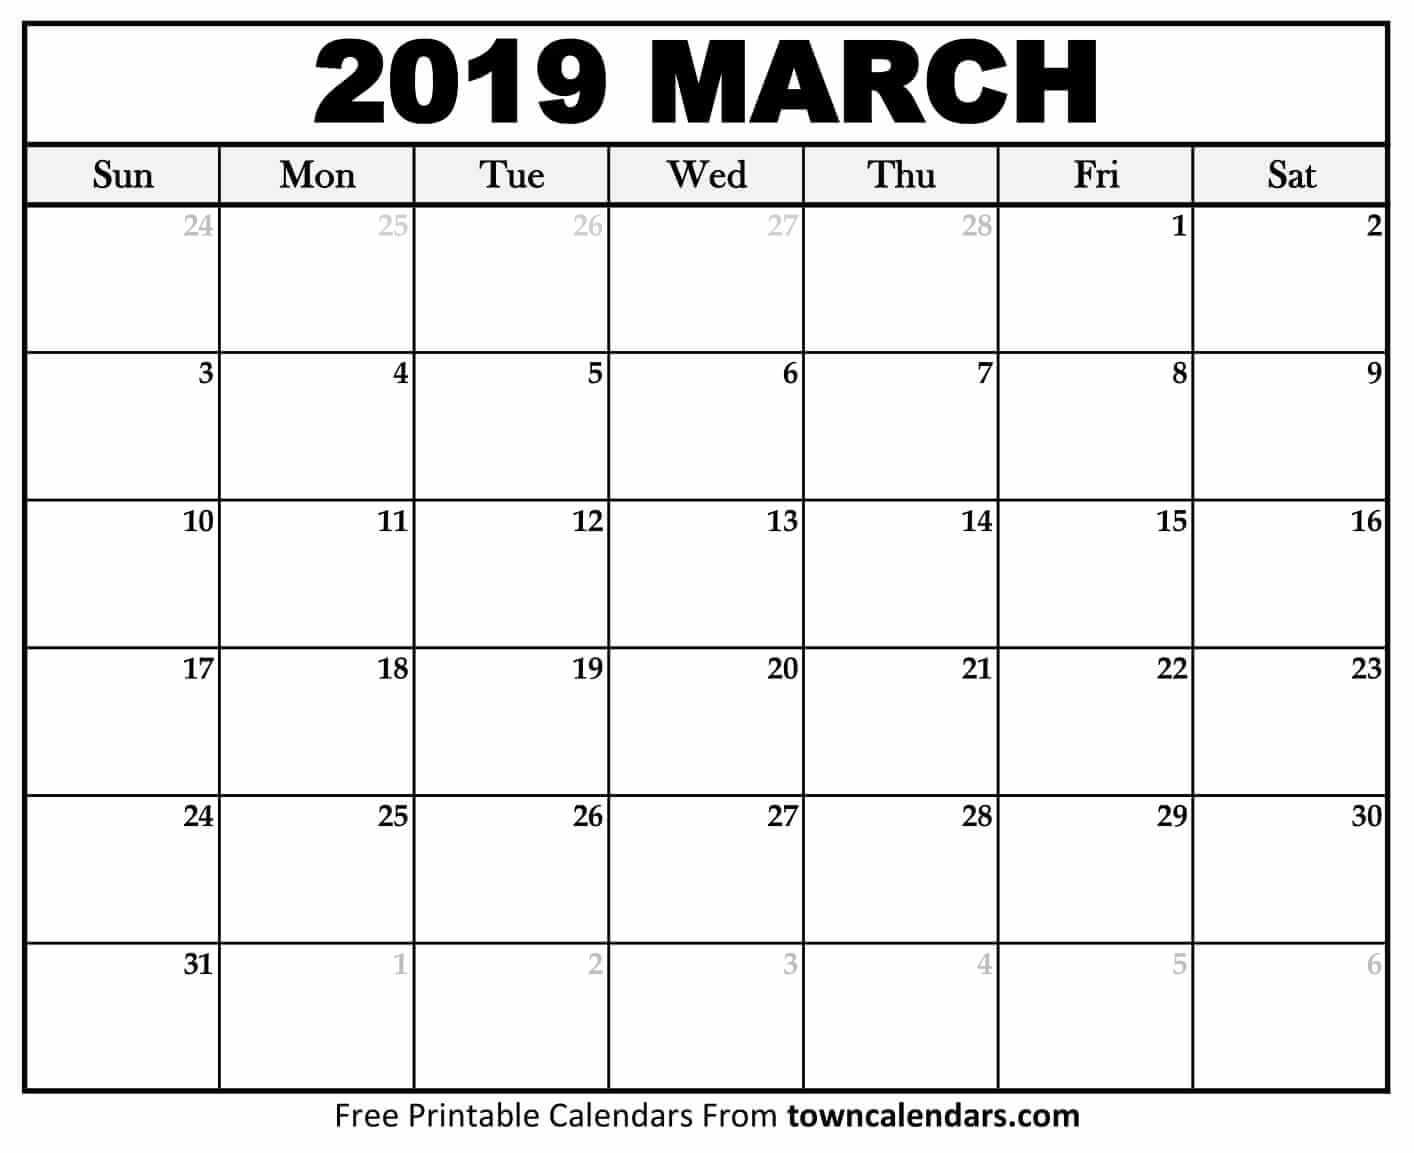 Printable March 2019 Calendar - Towncalendars - Free Printable March Activities